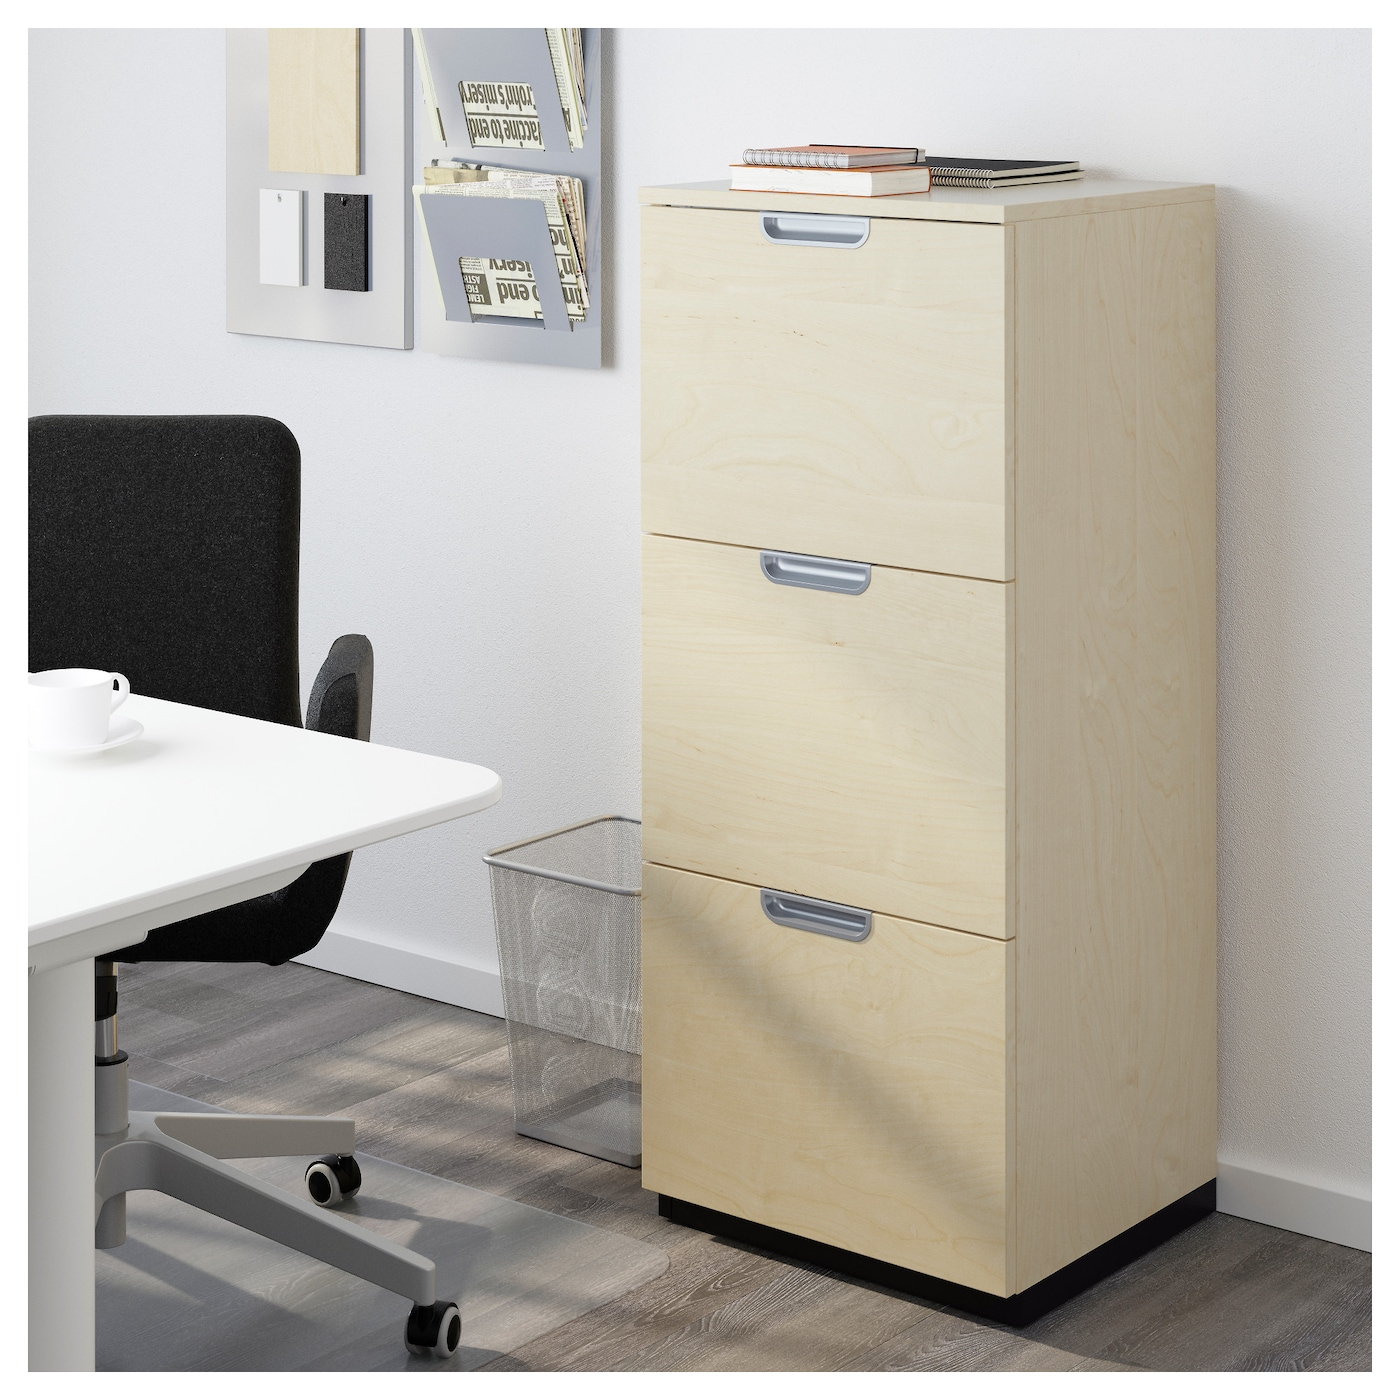 furniture file rails reviews drawer pdx zipcode wayfair design filing lexington cabinet